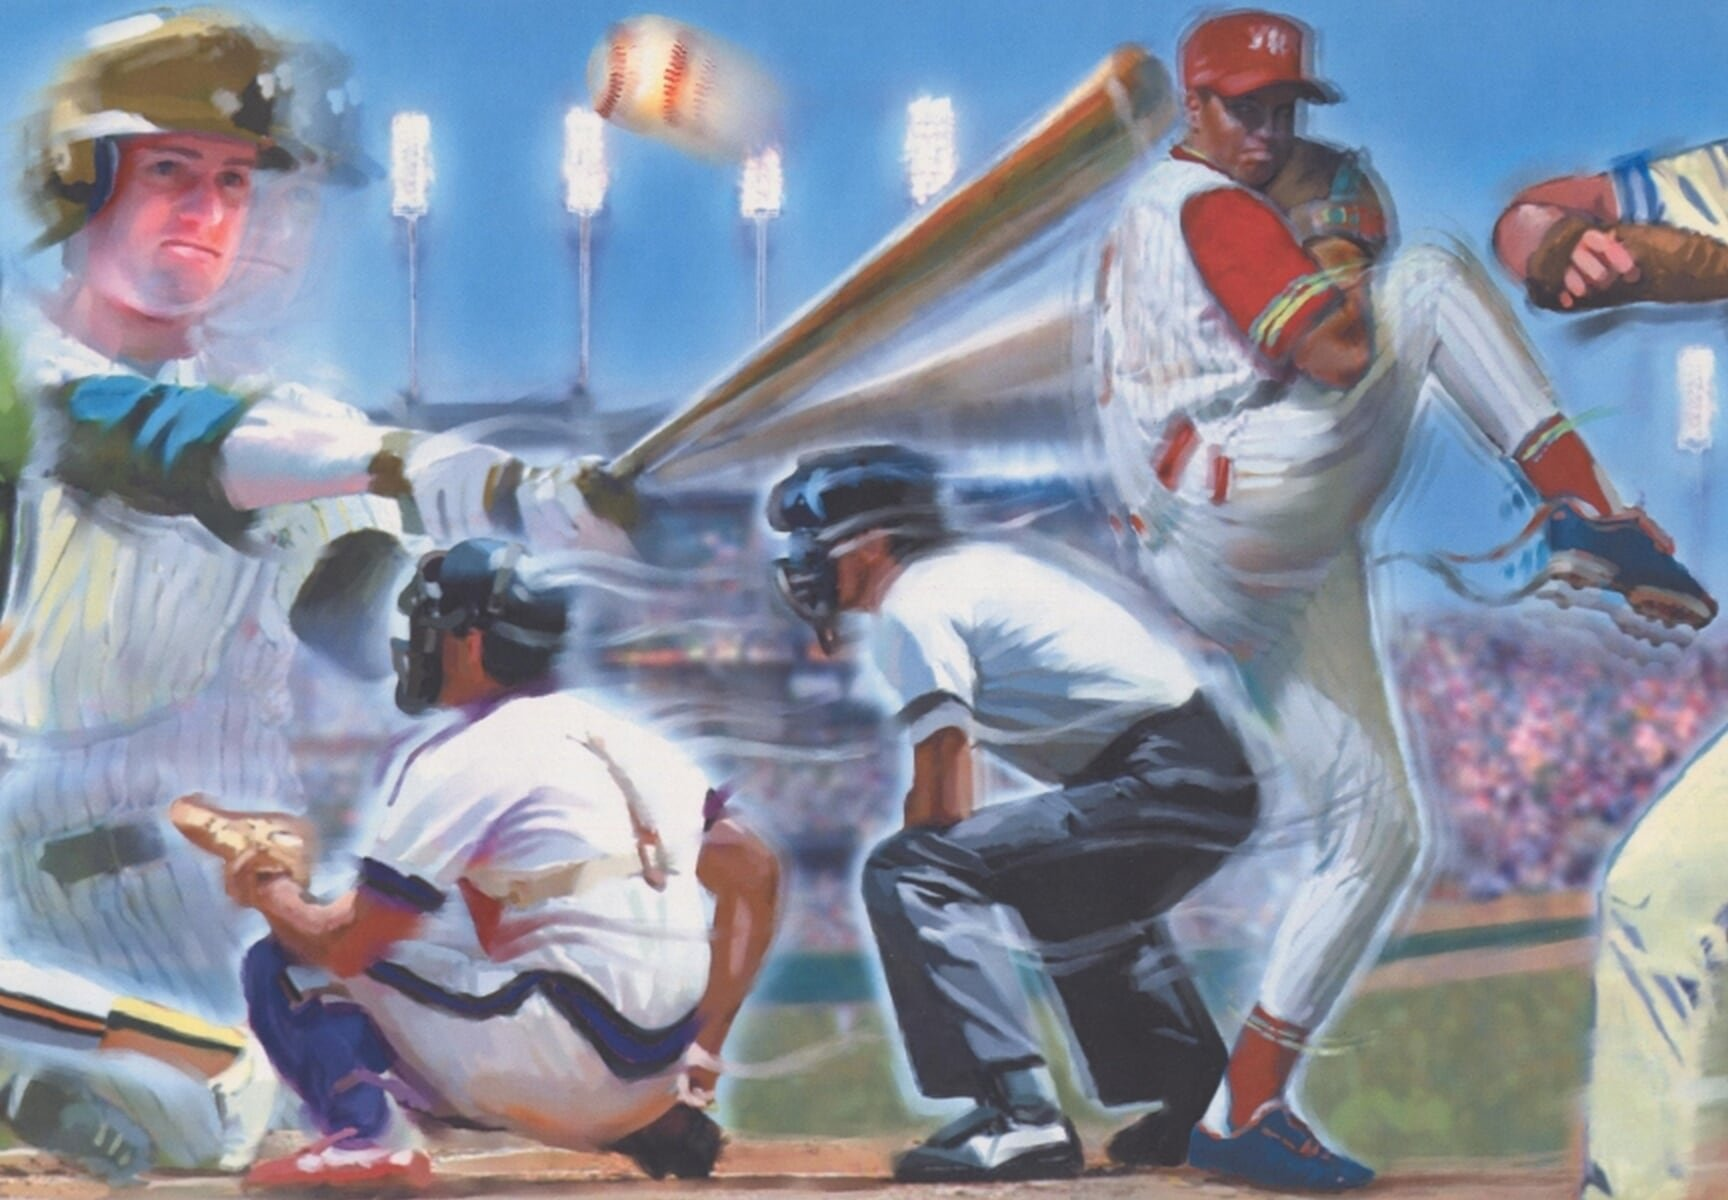 Baseball Players Umpire Pitcher Batter Ball Park Vintage Wallpaper Border Retro Design, Roll 15' x 10''